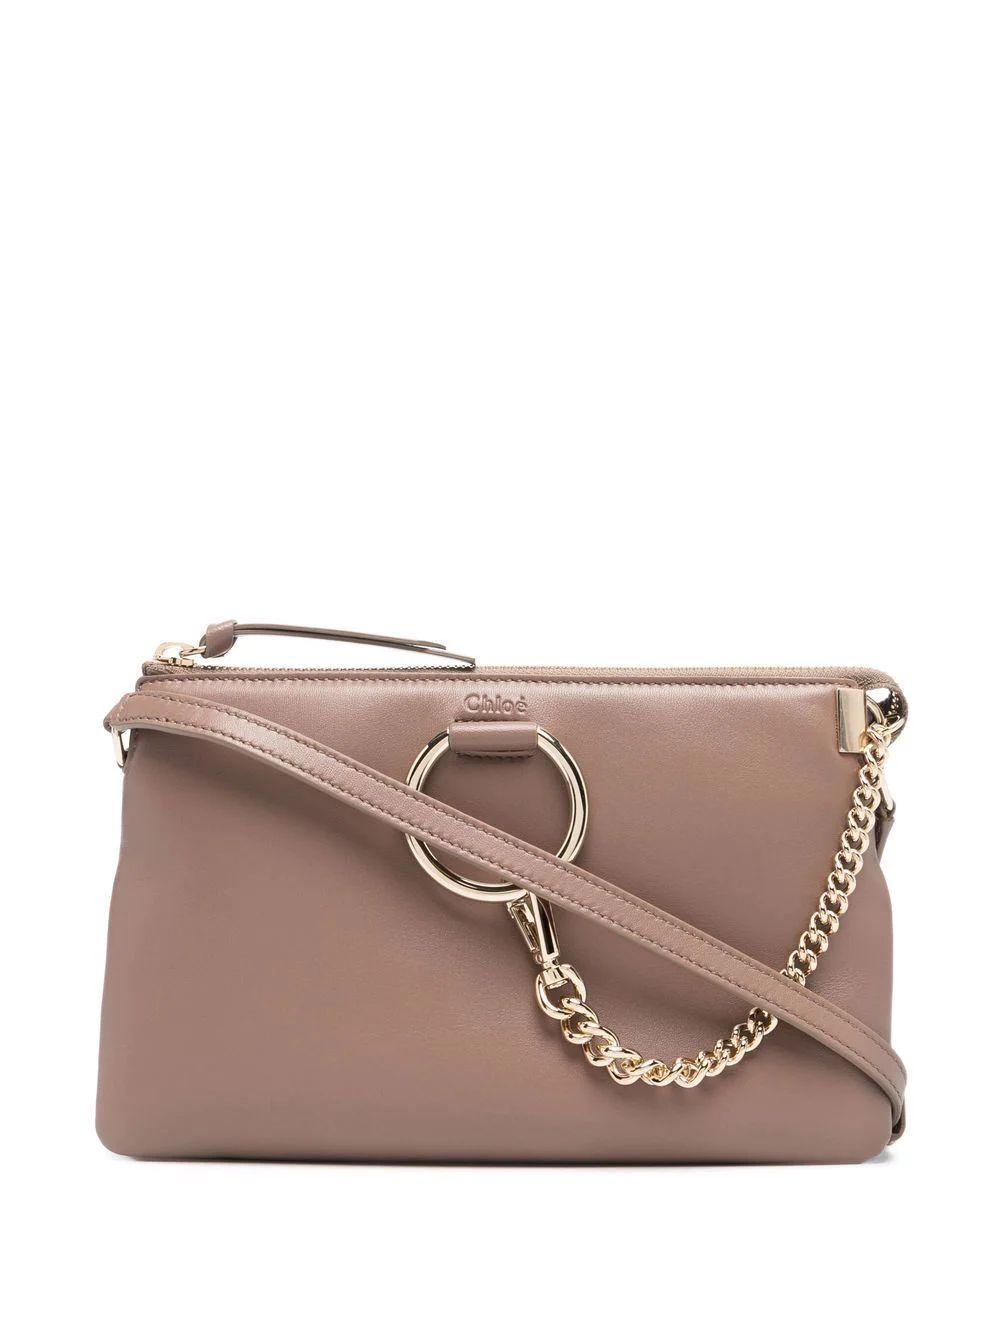 Faye Crossbody Bag Item # CHC21AS414F17